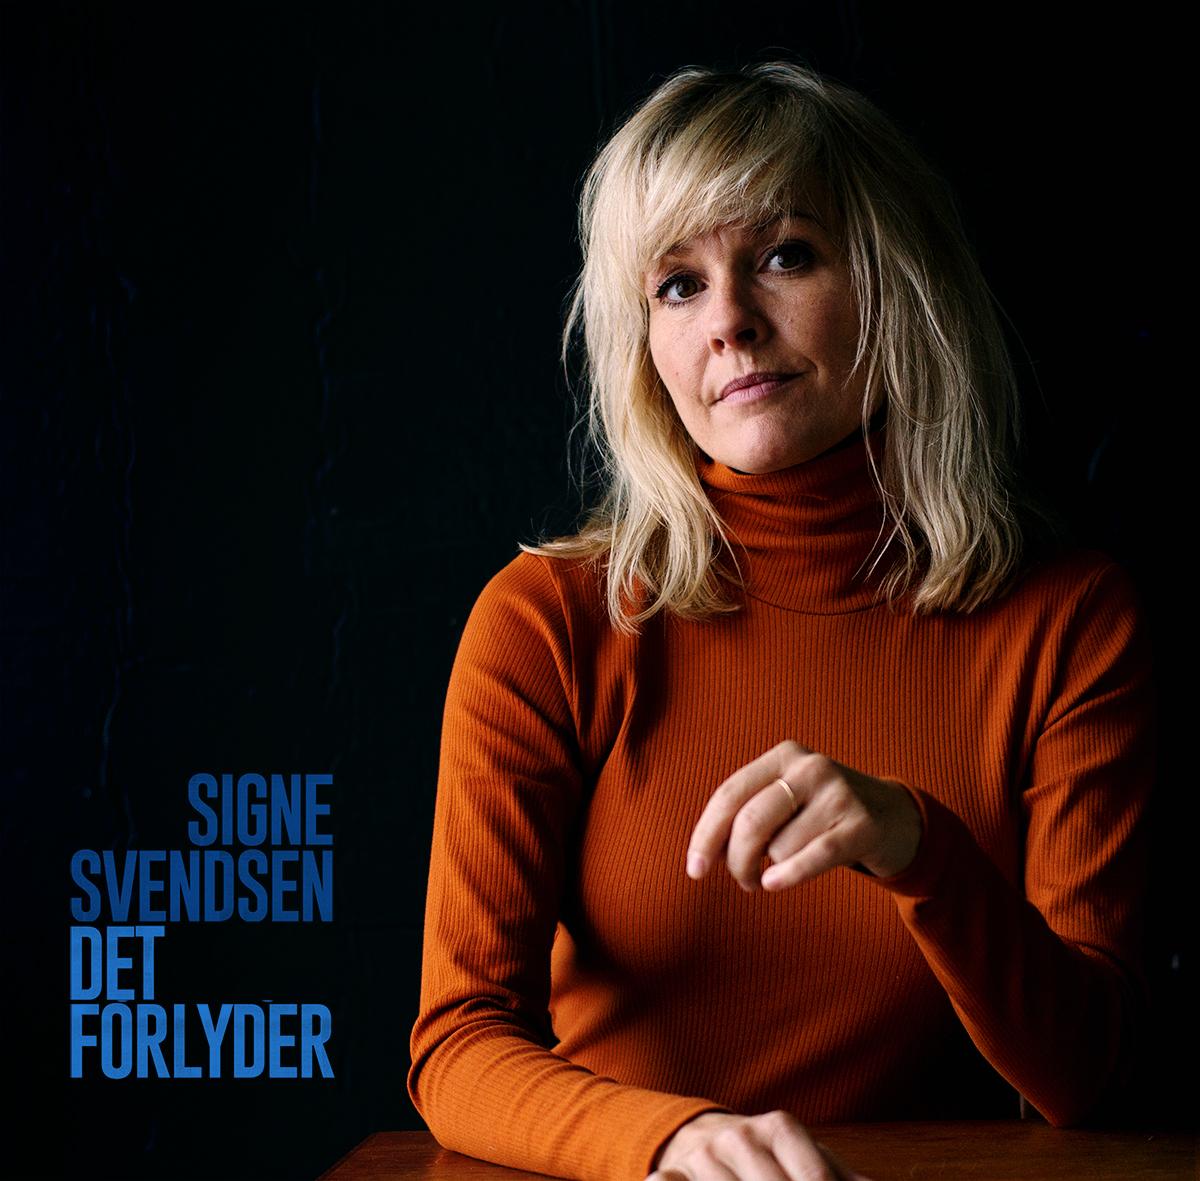 Signe Svendsen